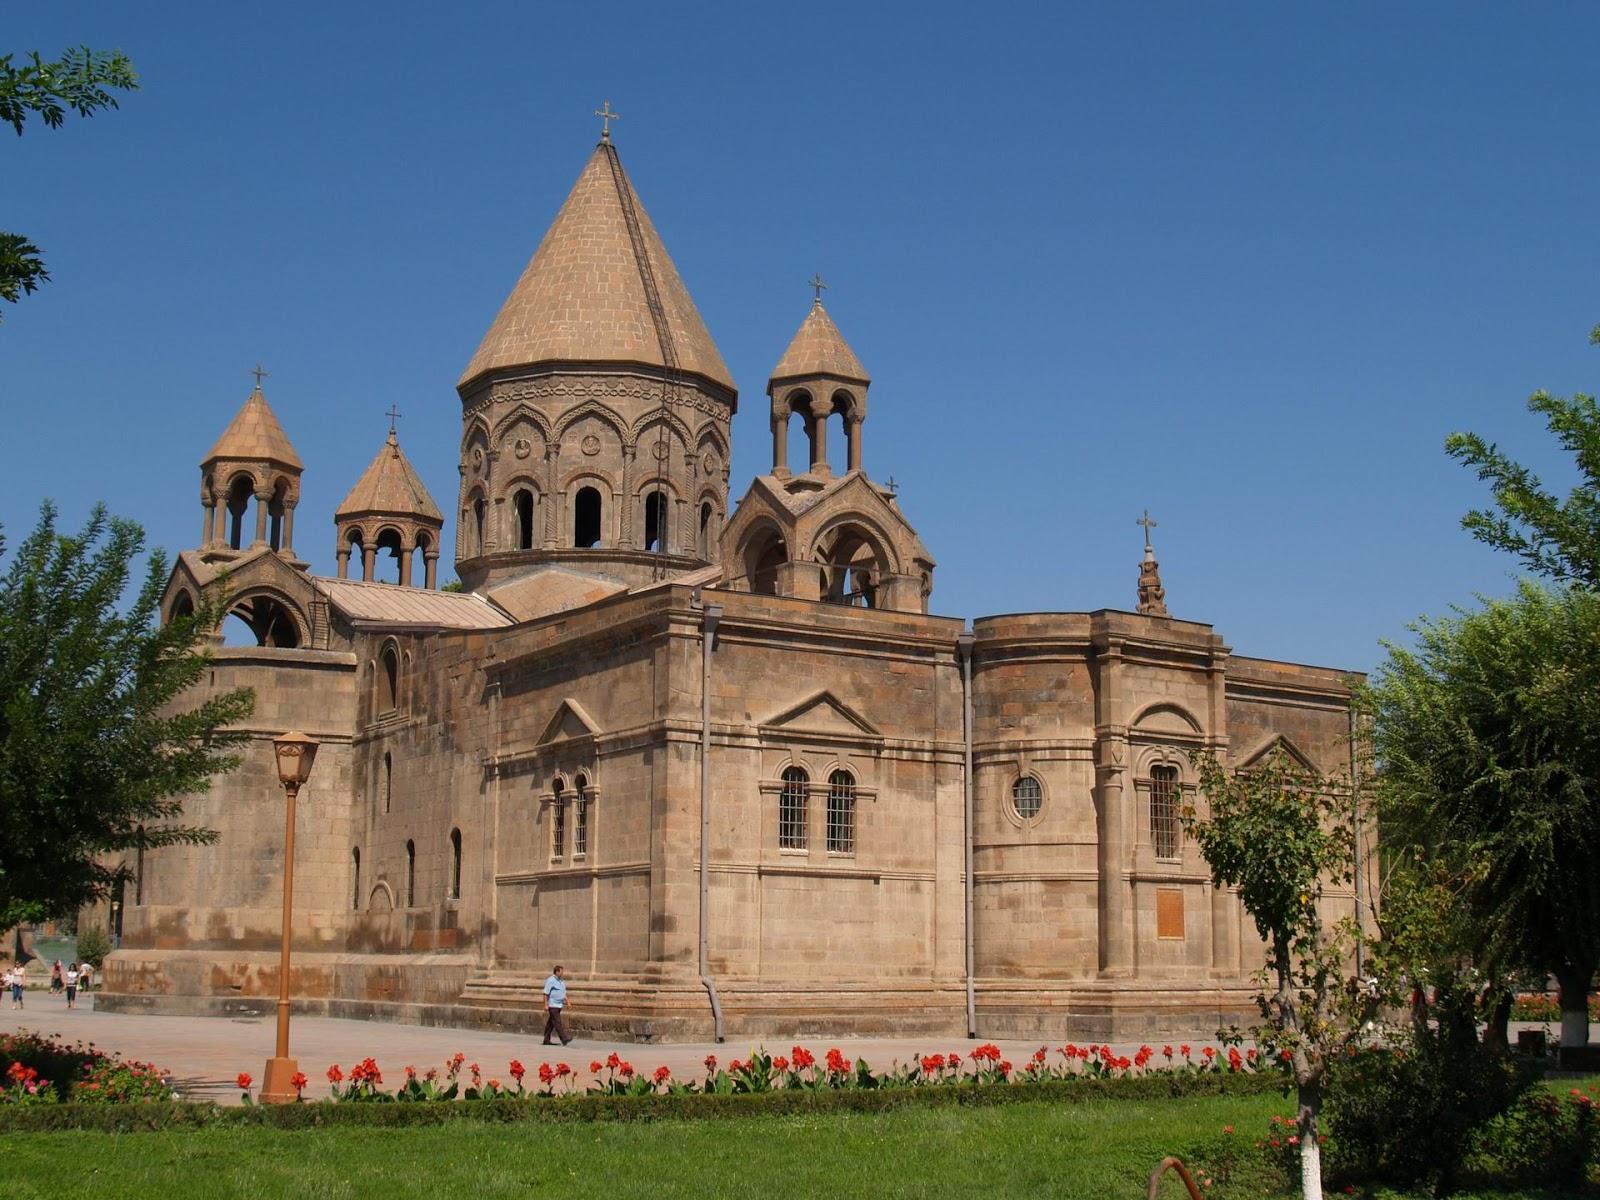 Armenia Tourist Places  Yerevan City Pictures  Cini Clips-5035